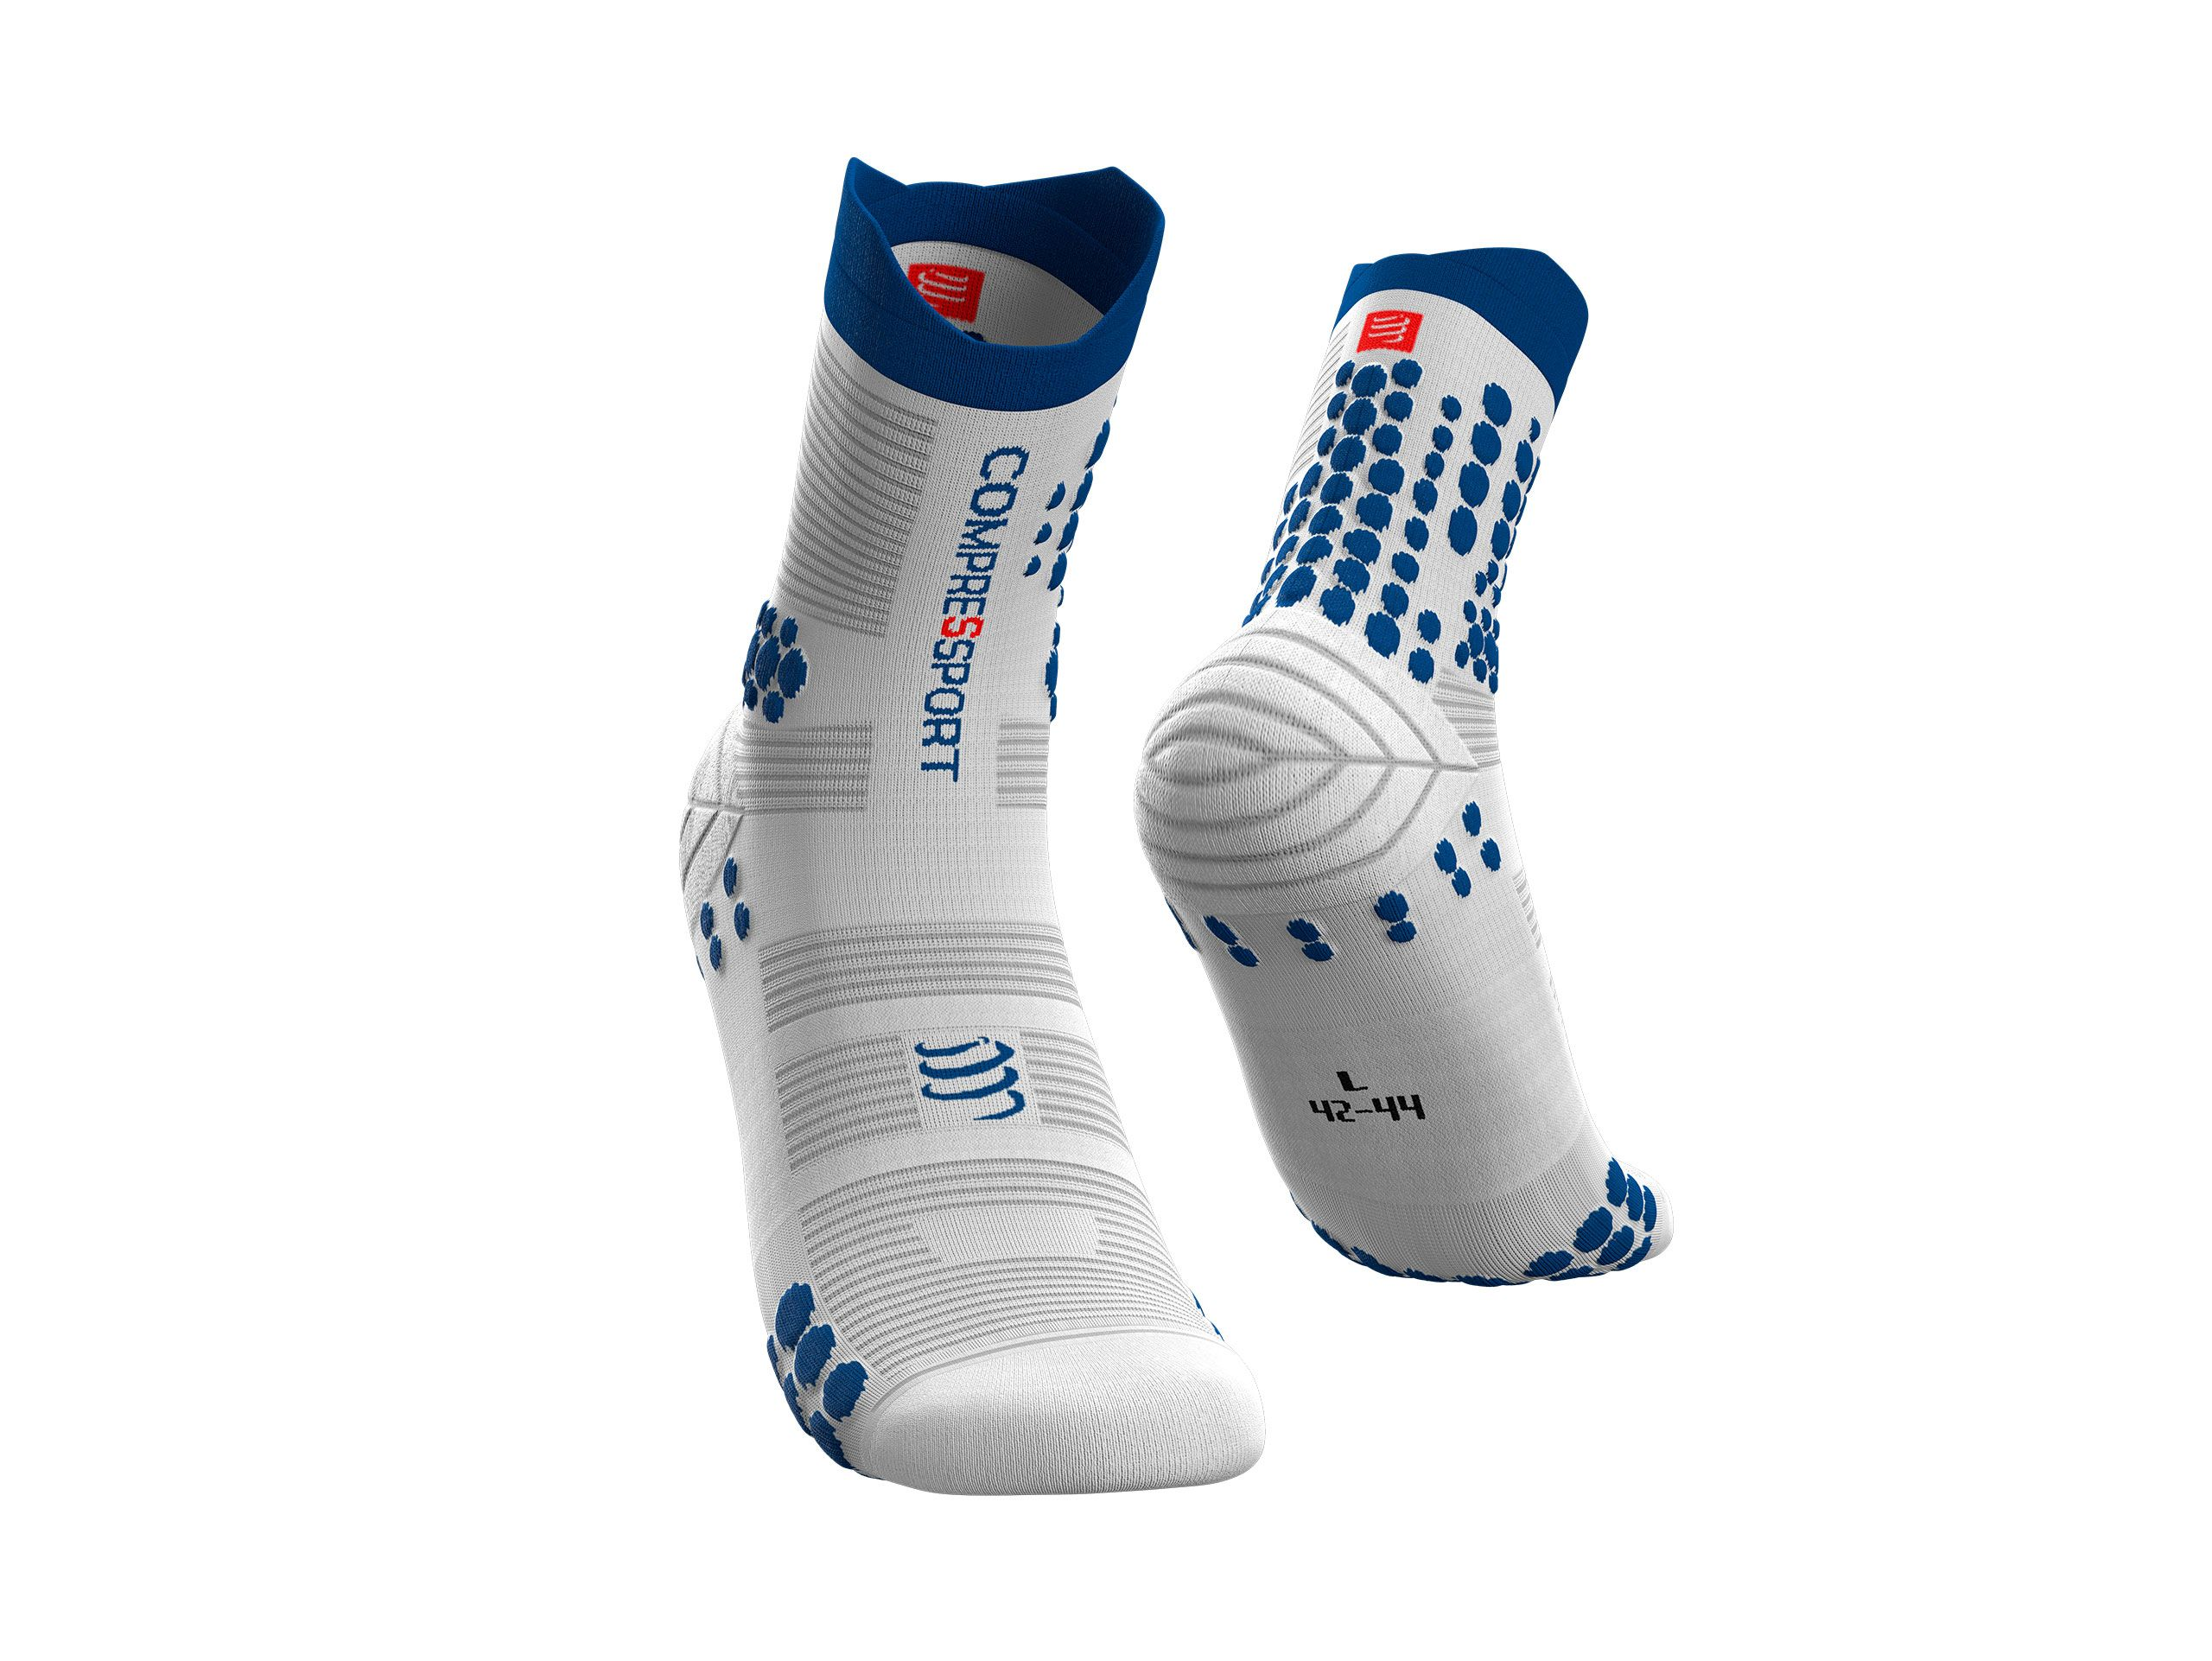 Pro Racing Socks v3.0 Trail - Blanc-Lolite